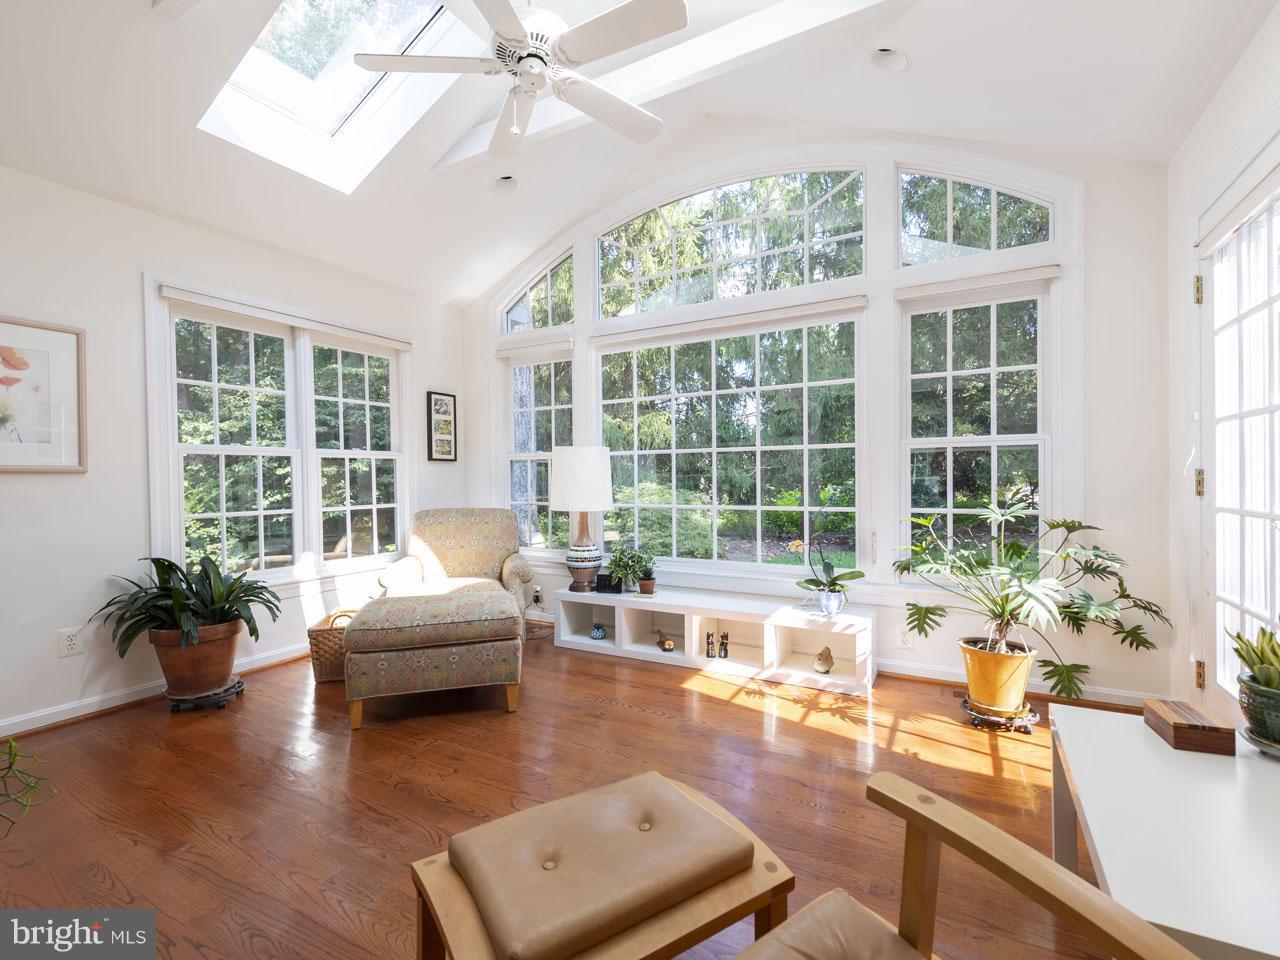 1006211278-300688039333-2021-07-22-07-39-38        Burke Delaware Real Estate For Sale   MLS# 1006211278  - Best of Northern Virginia